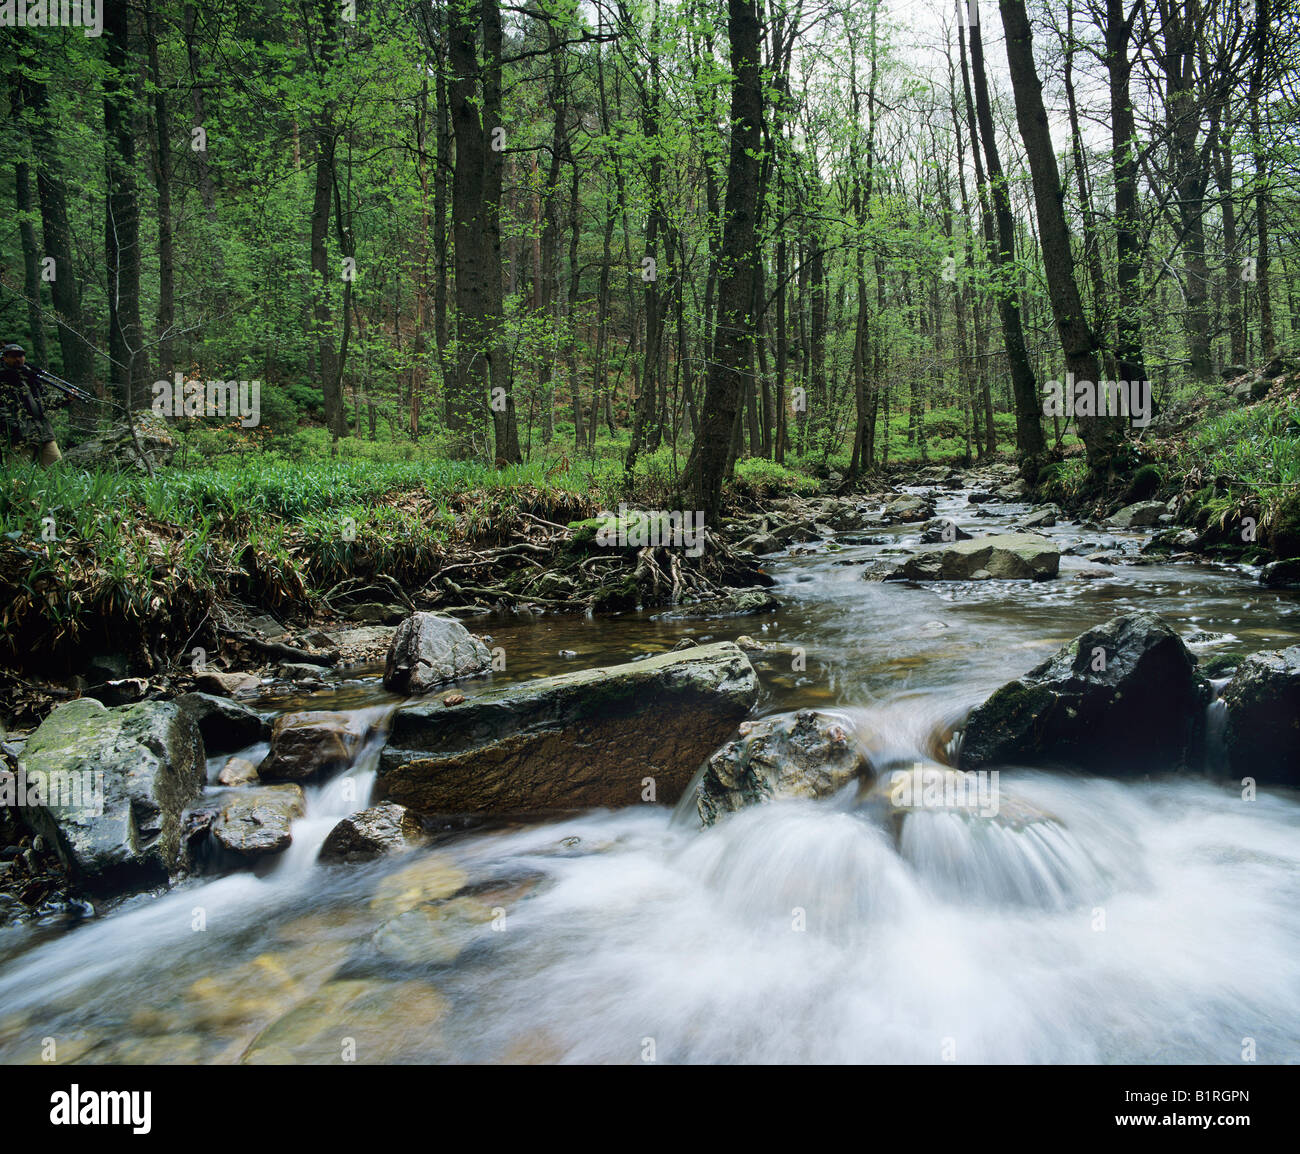 Naturwald Bach im Frühjahr, hohes Venn, Eifel, Deutschland, Europa Stockbild